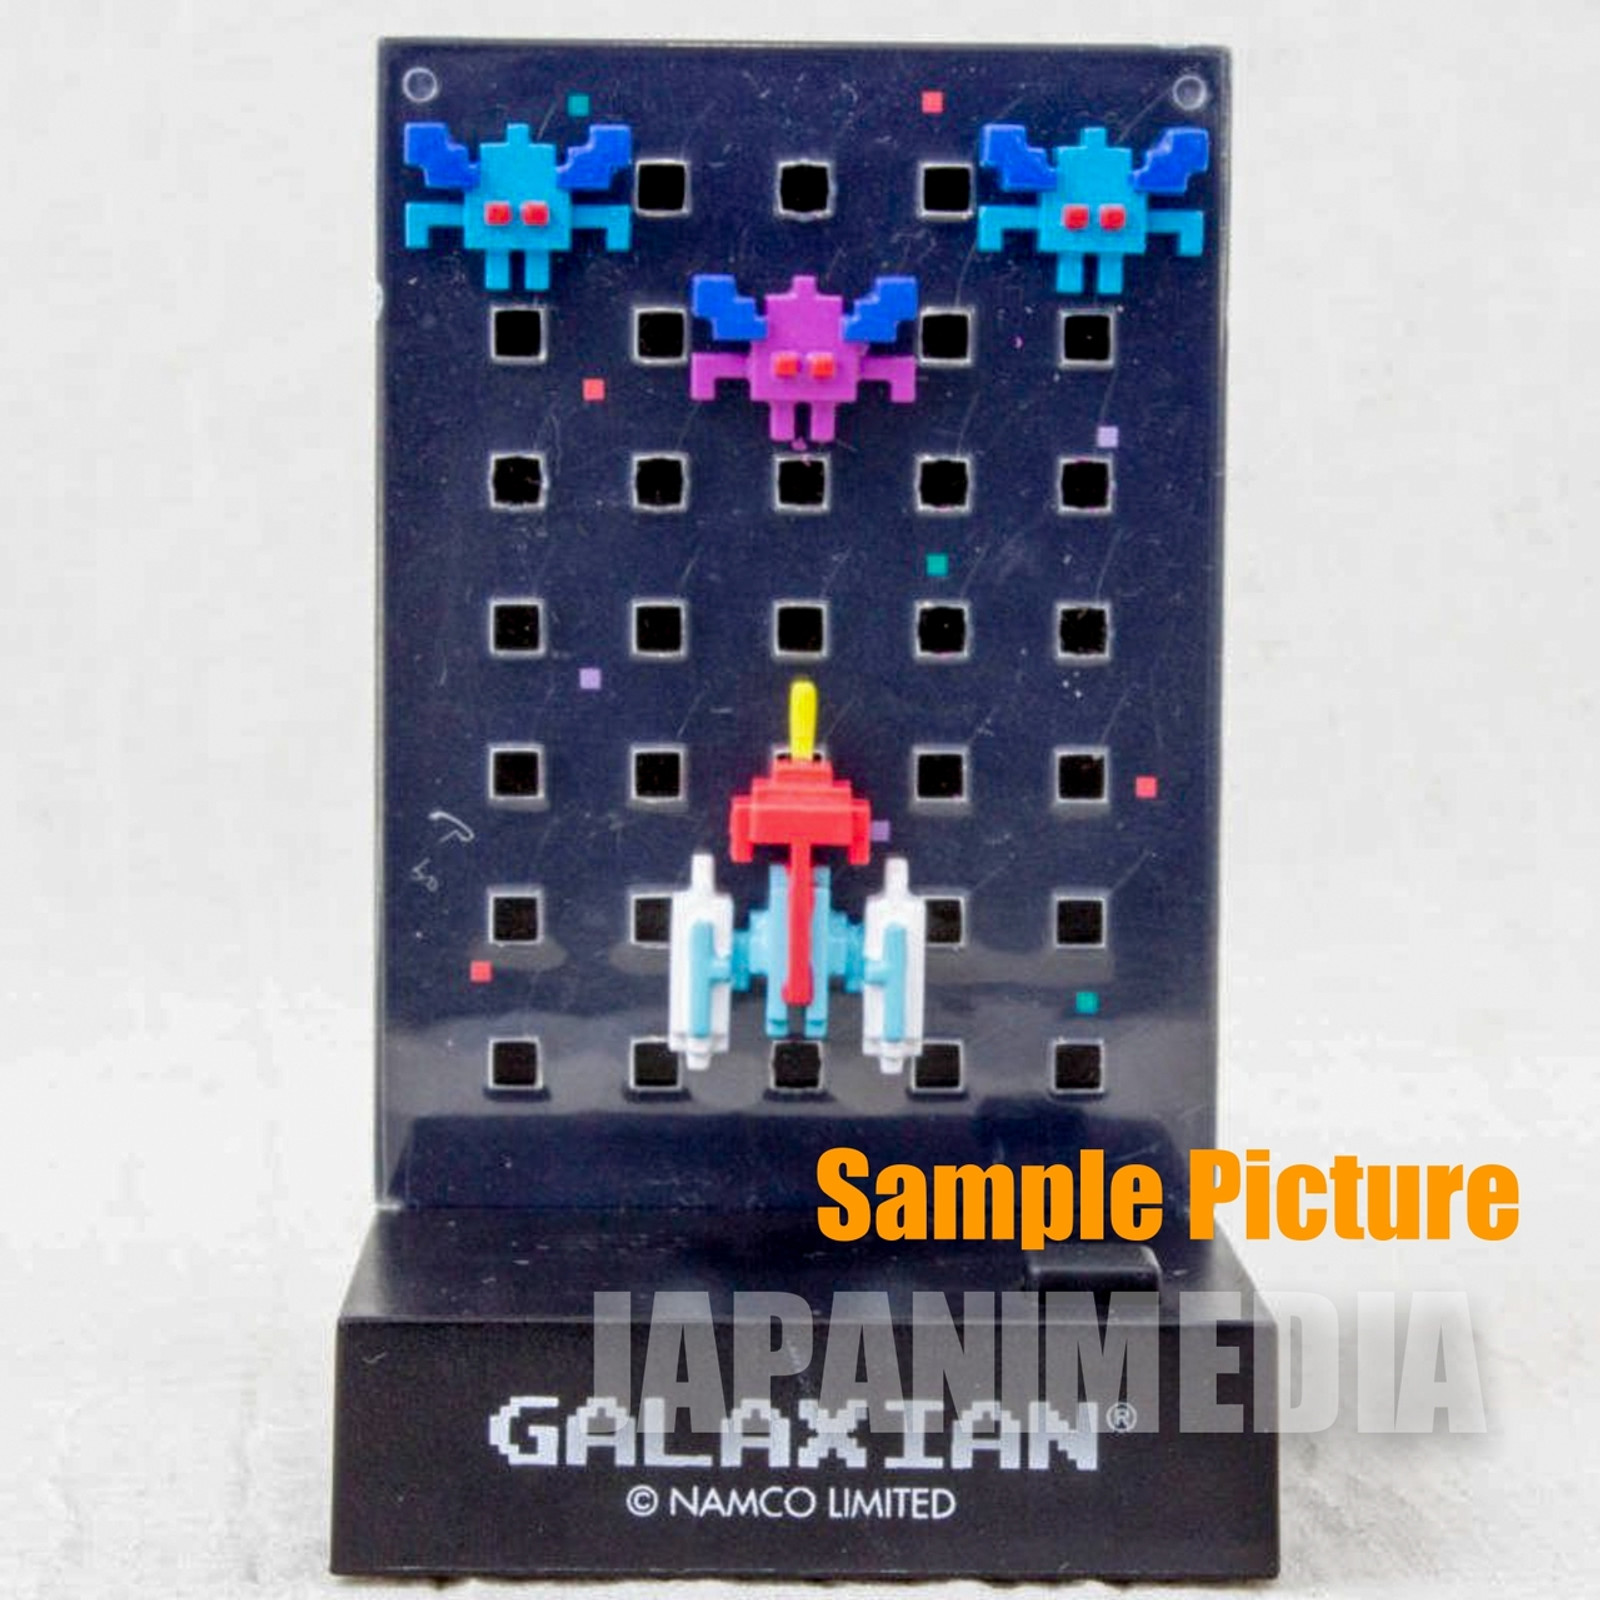 RARE! Namco Dotgraphics Galaxian Figure with Game Sound JAPAN FAMICOM